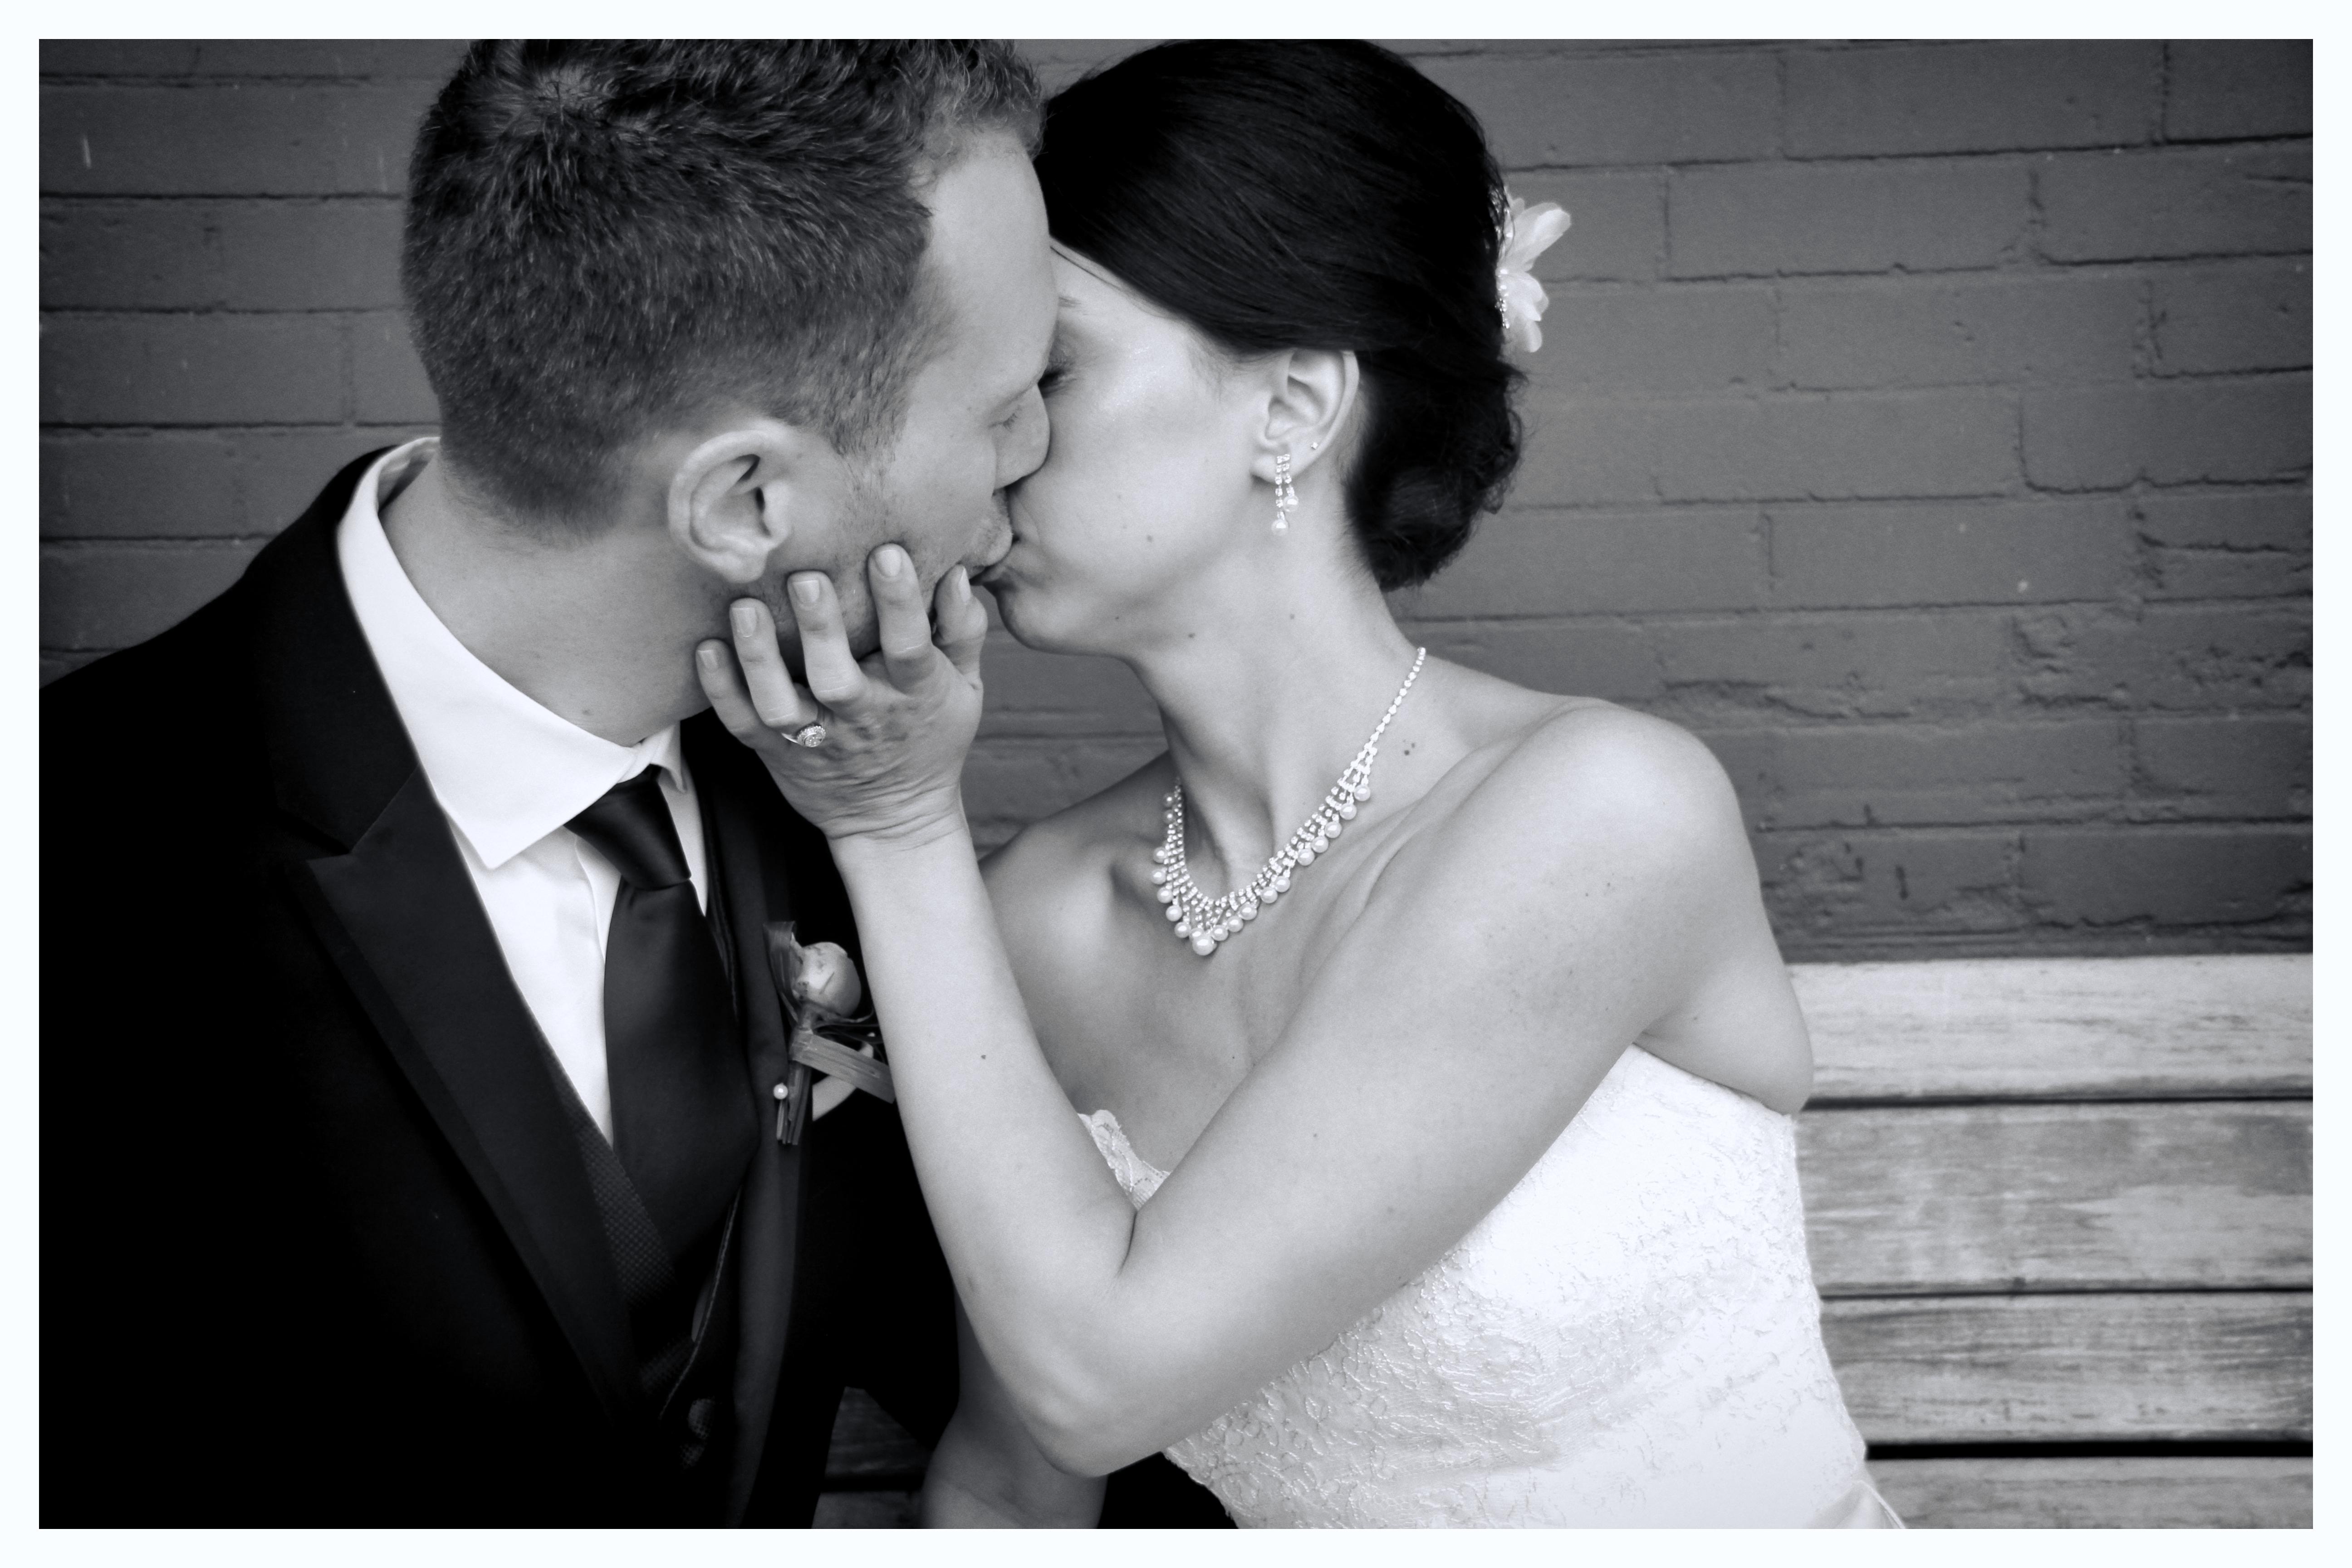 Photographie mariage St-Hyacinthe